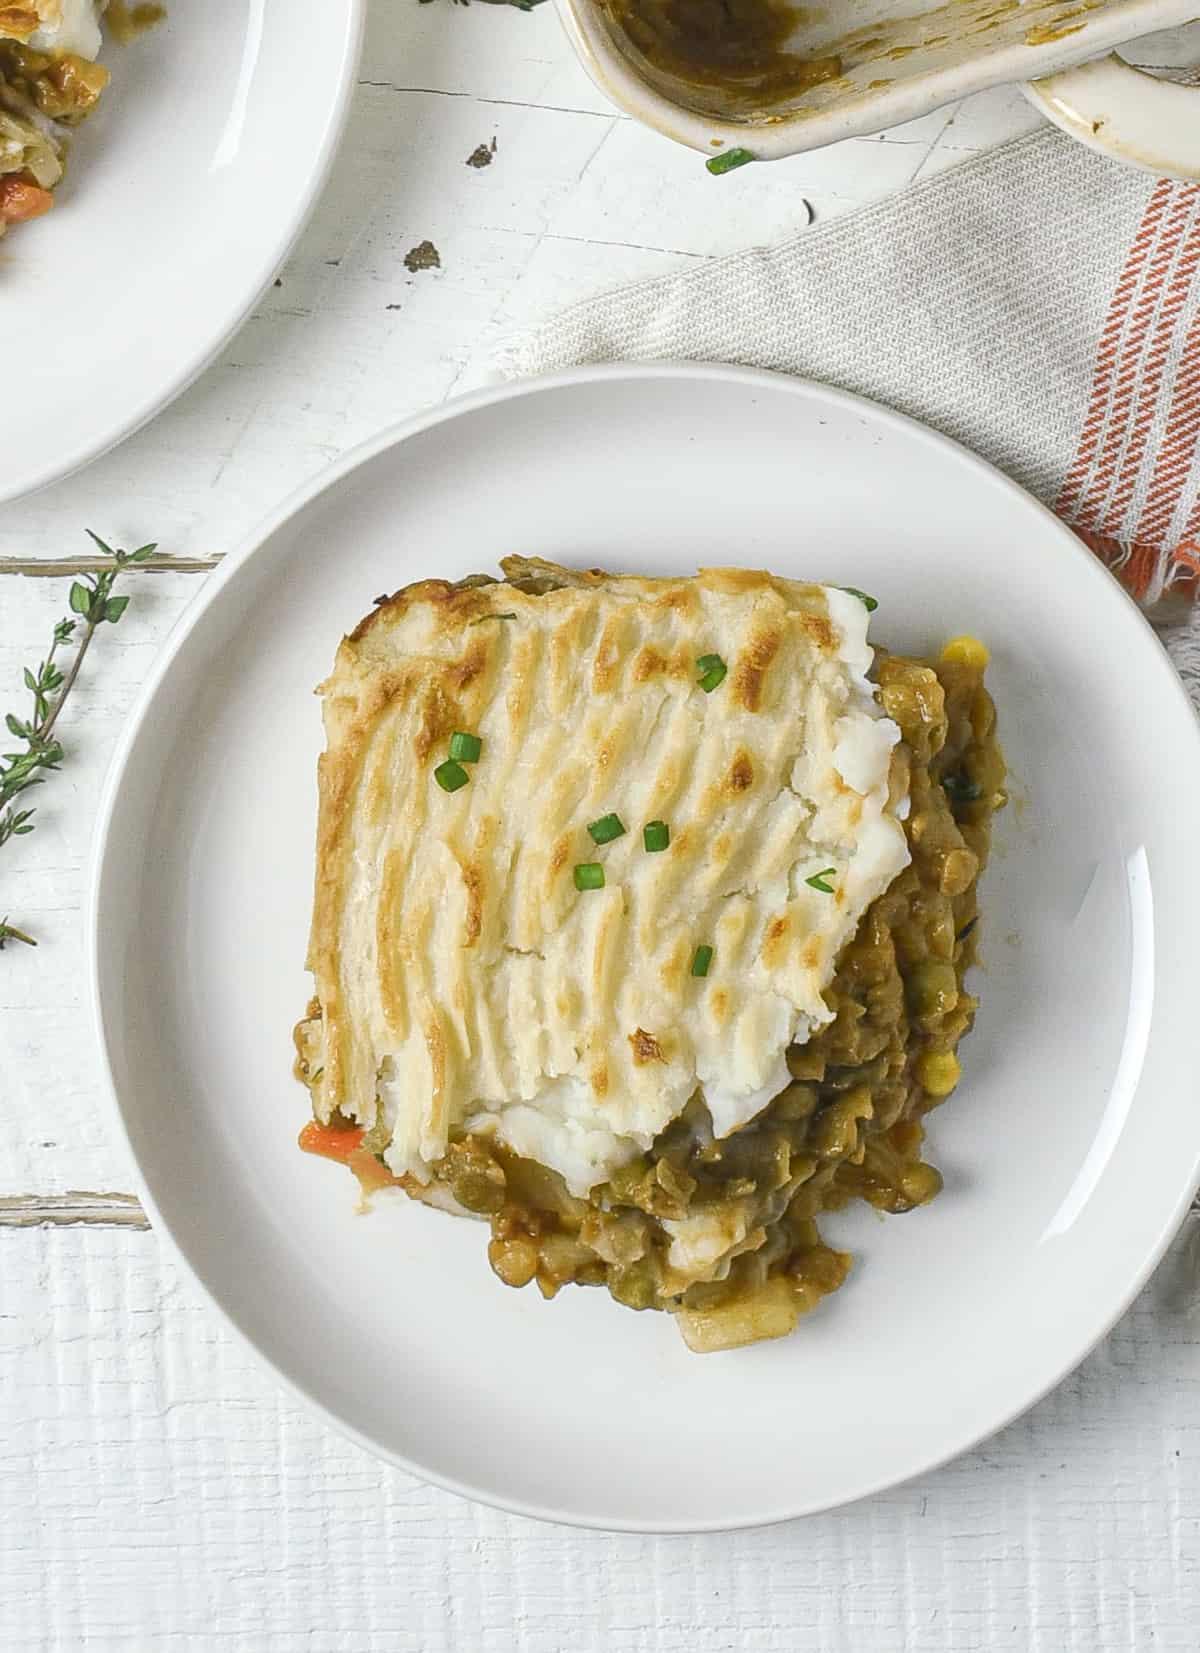 Vegan shepherd's pie on plate.